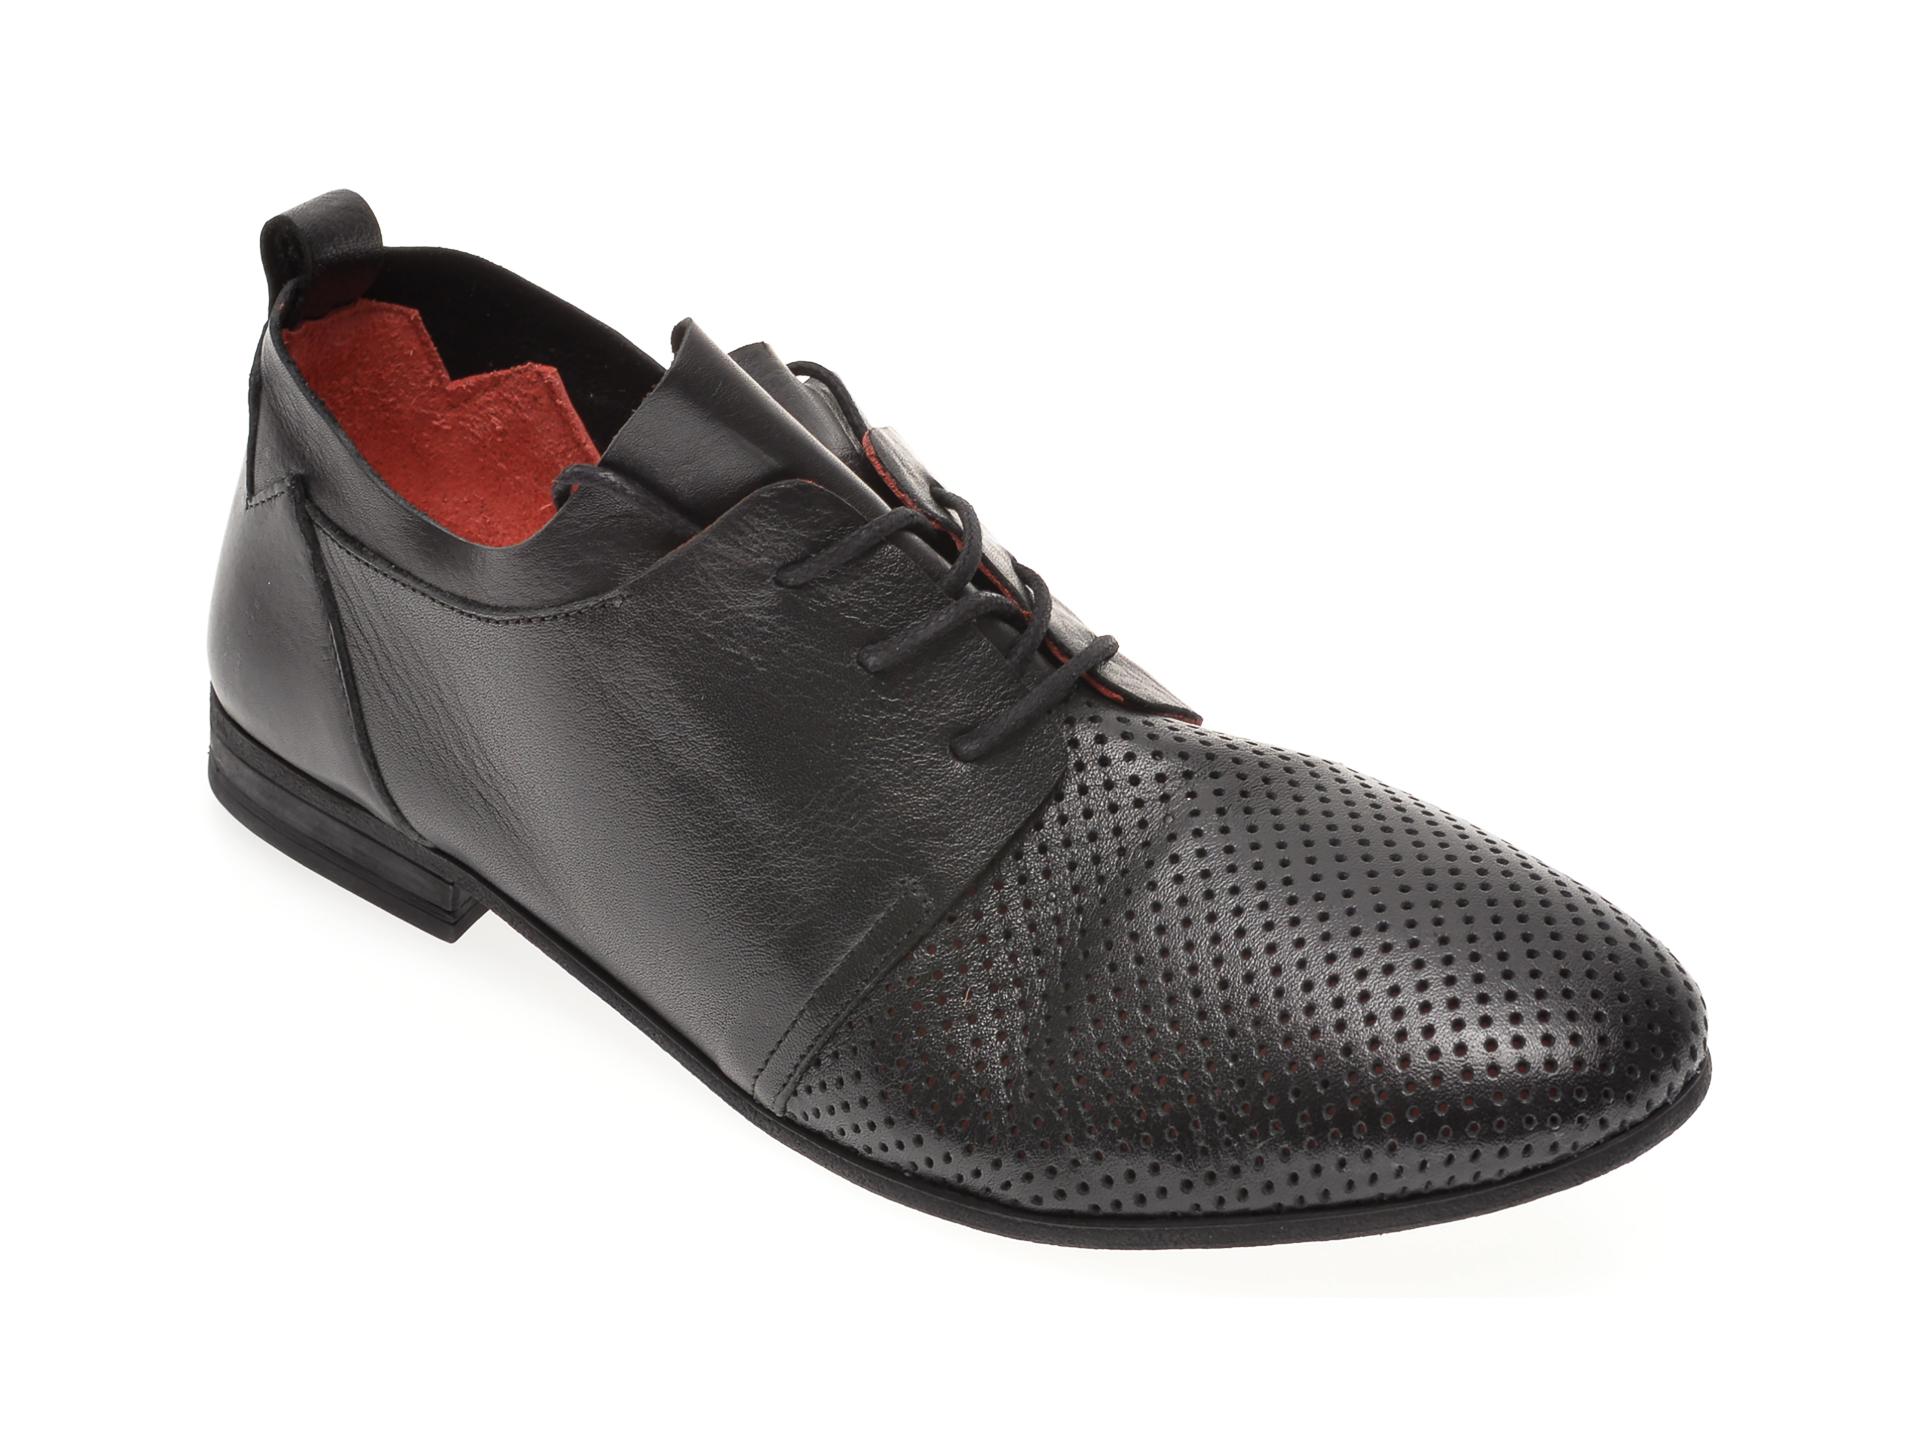 Pantofi BABOOS negri, 1105, din piele naturala